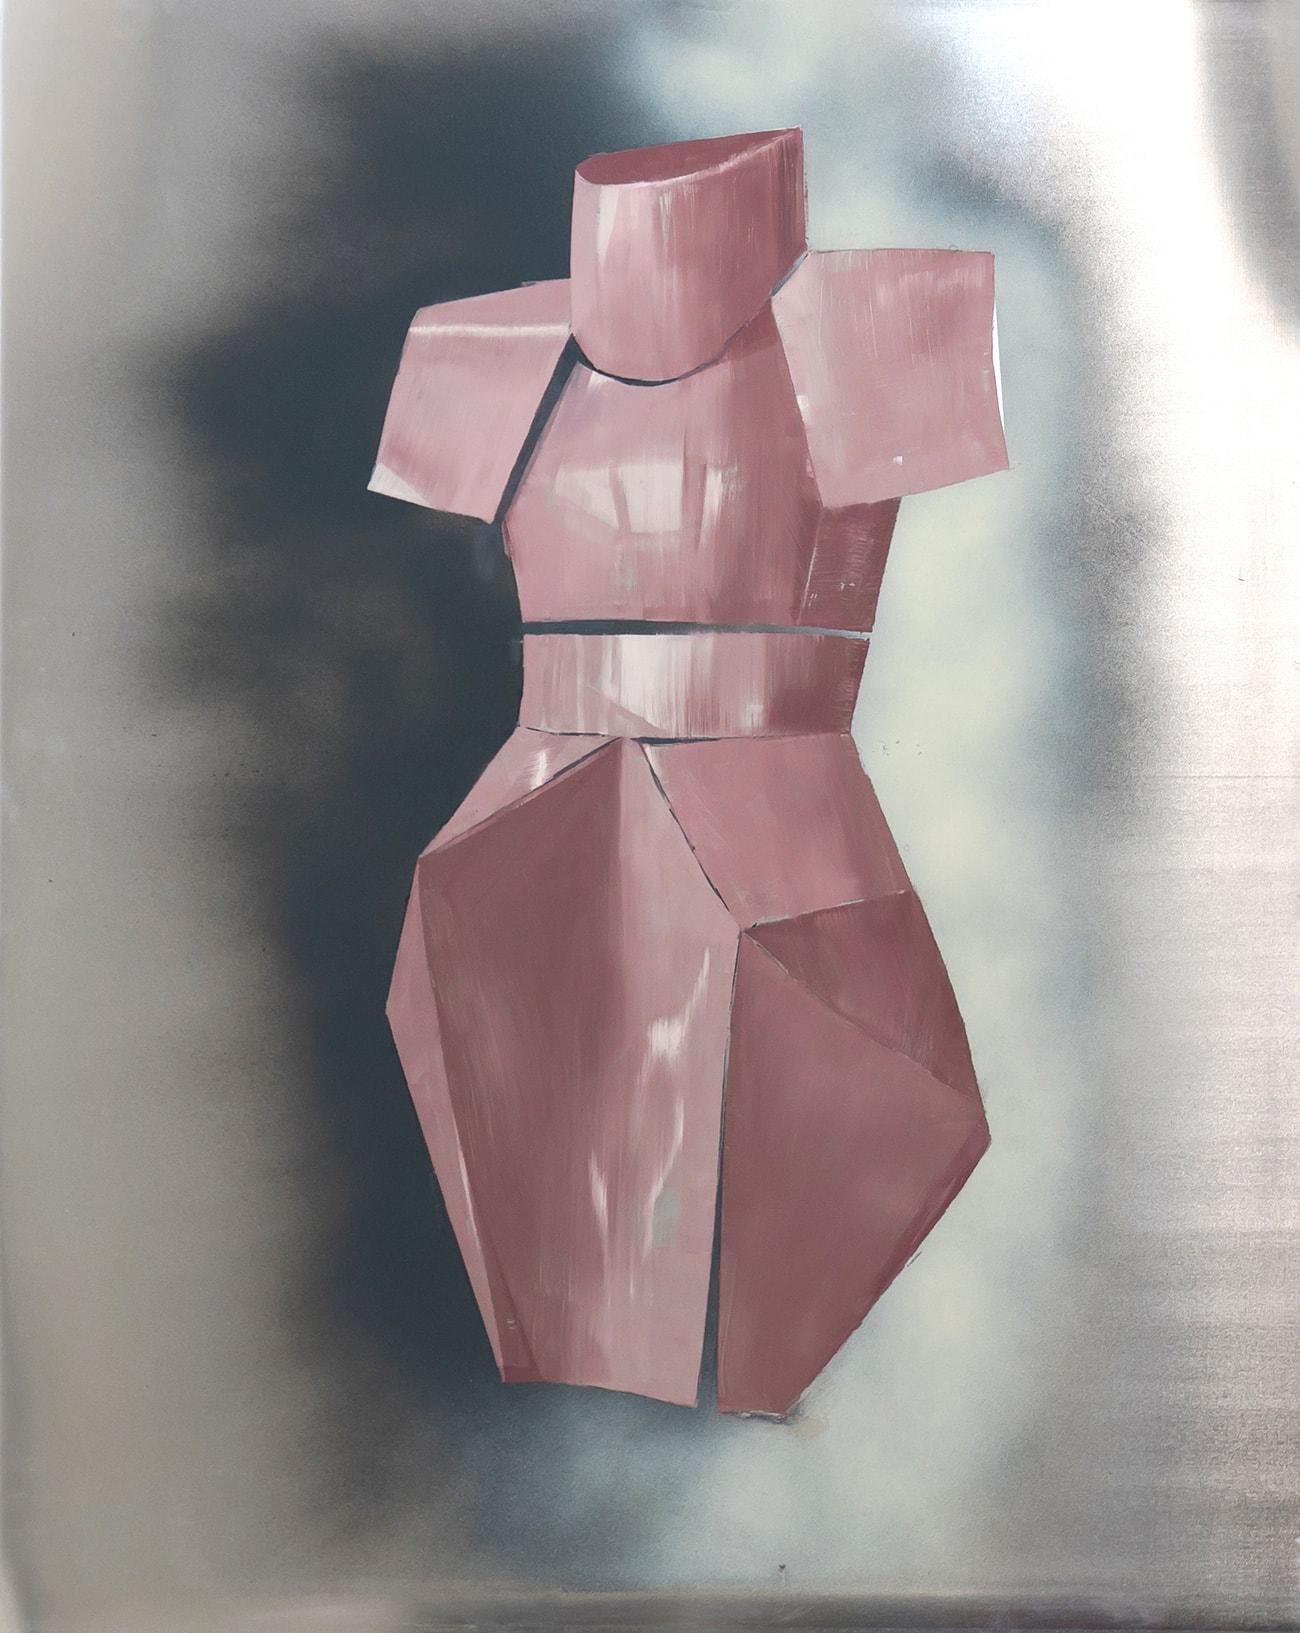 Pink armor - Isabel Gómez Liebre